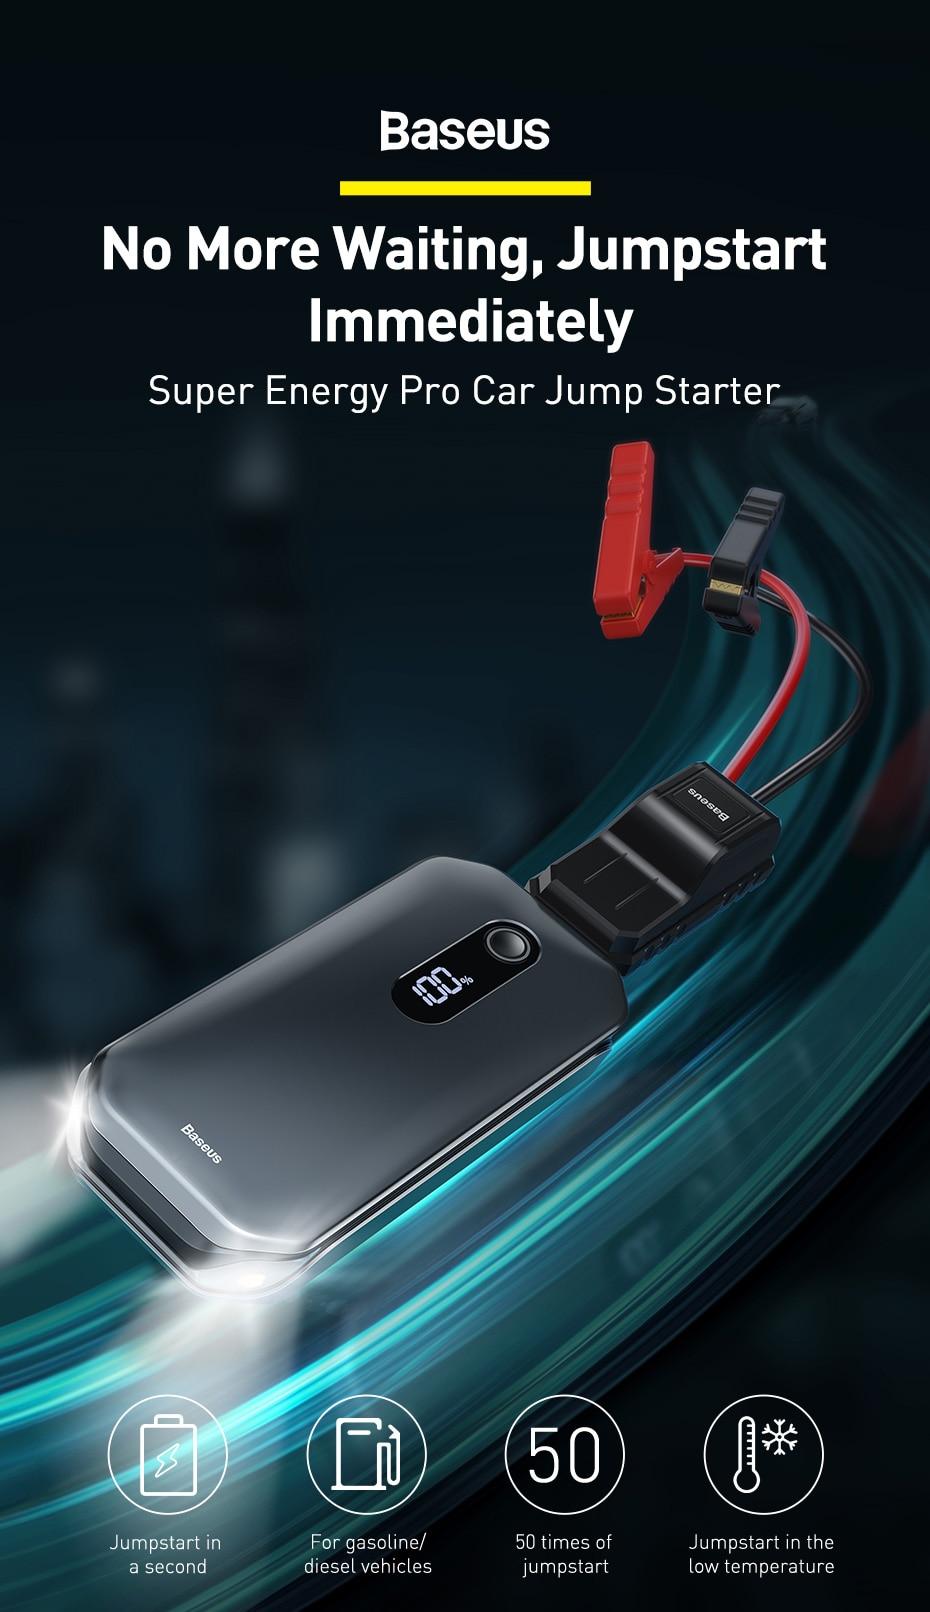 Baseus Super Energy Pro Car Jump Starter 4